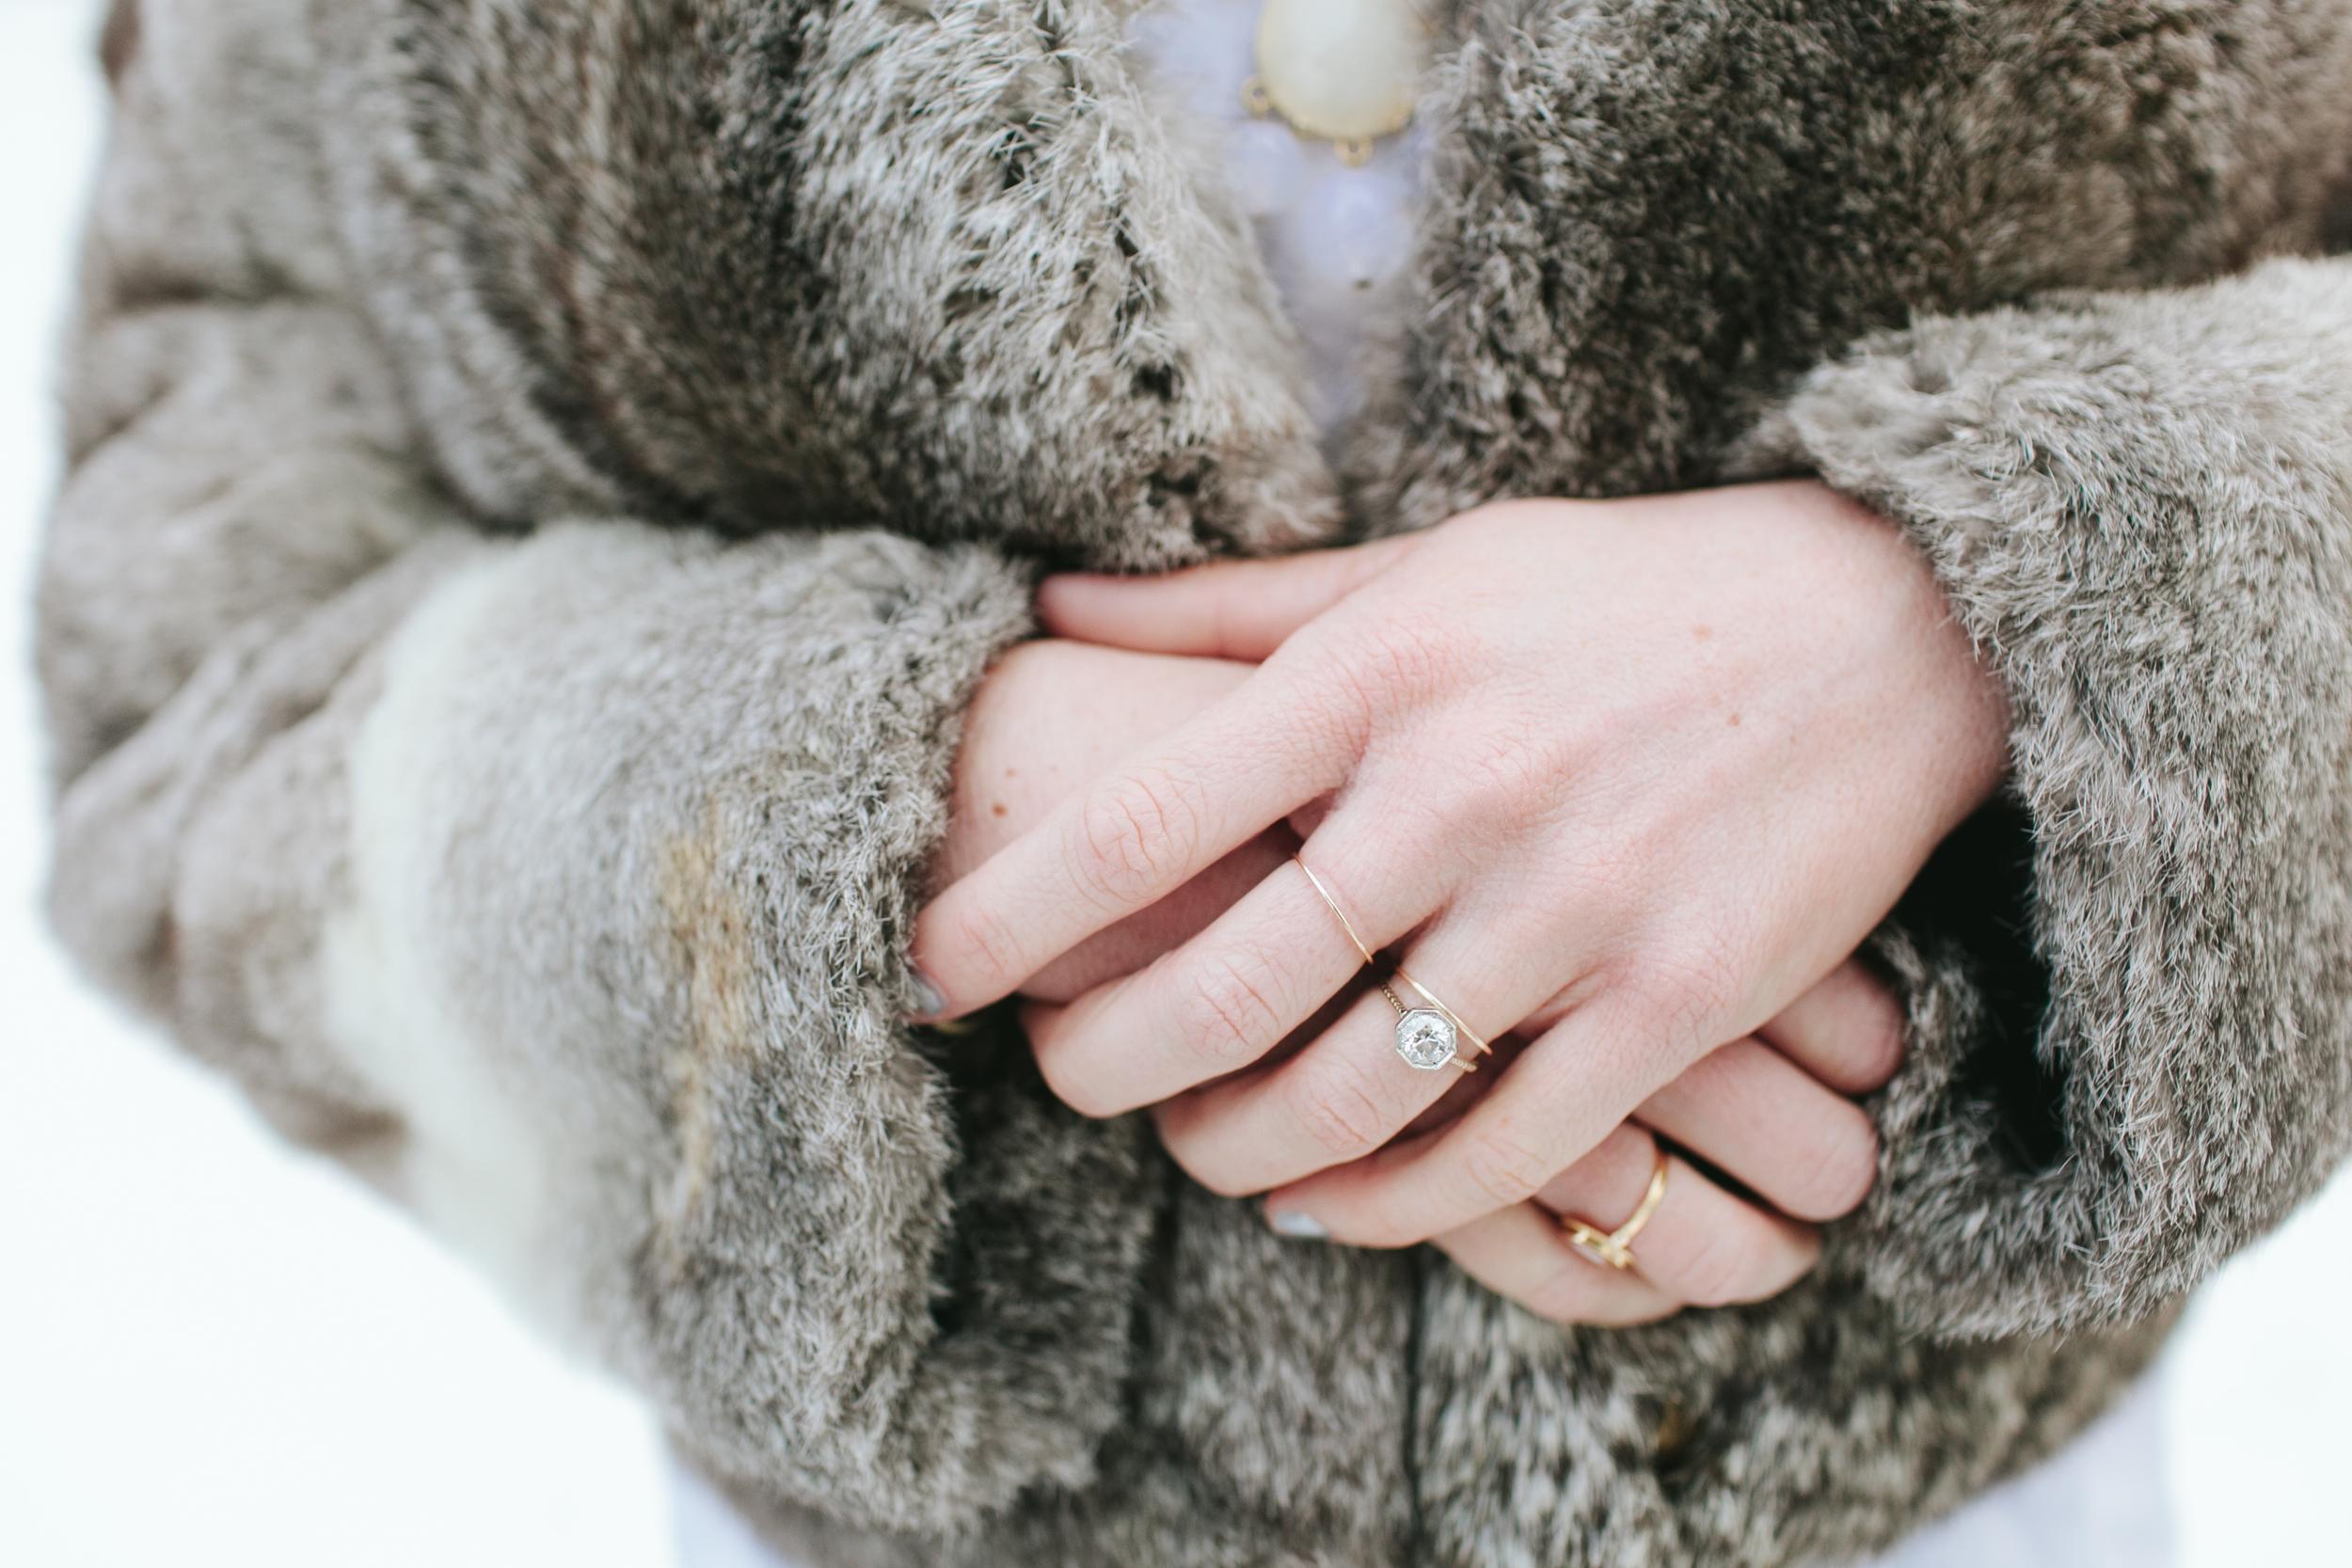 Atlanta-Fashion-Photographer-Kathryn-McCrary-Photography-Snow-Snowlanta-Fur-Coat-7.jpg